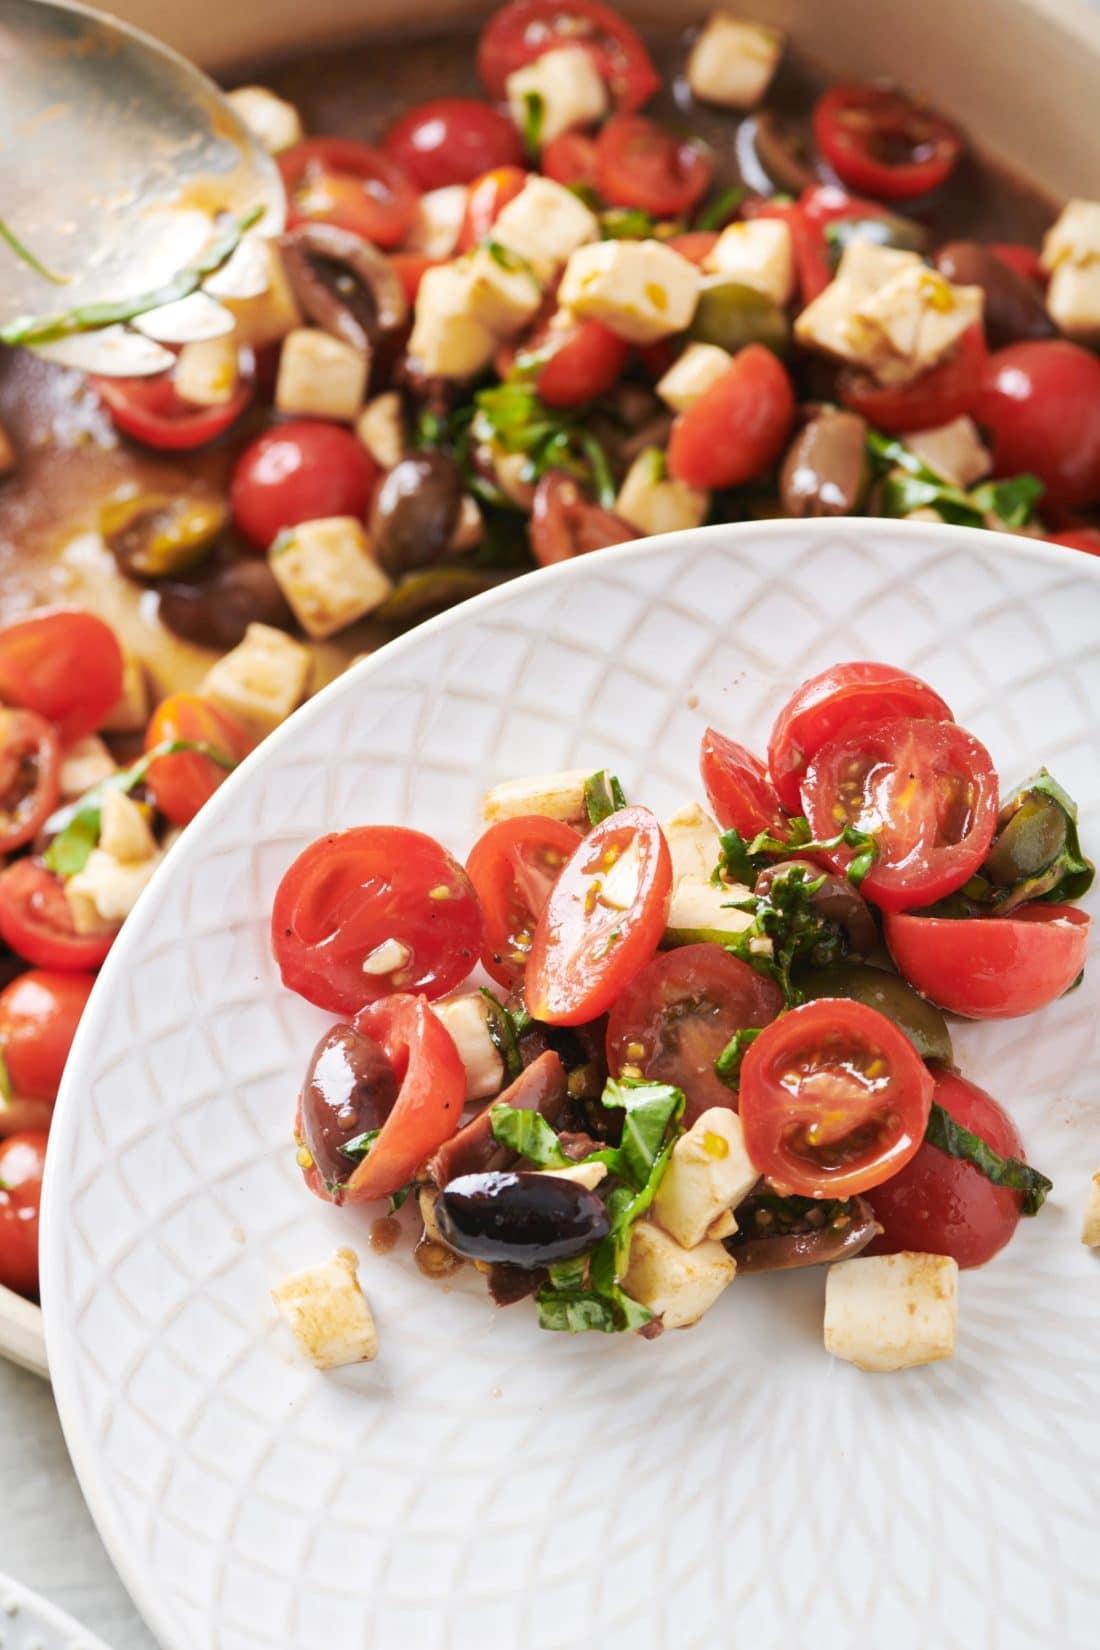 Tomato Mozzarella and Basil Salad